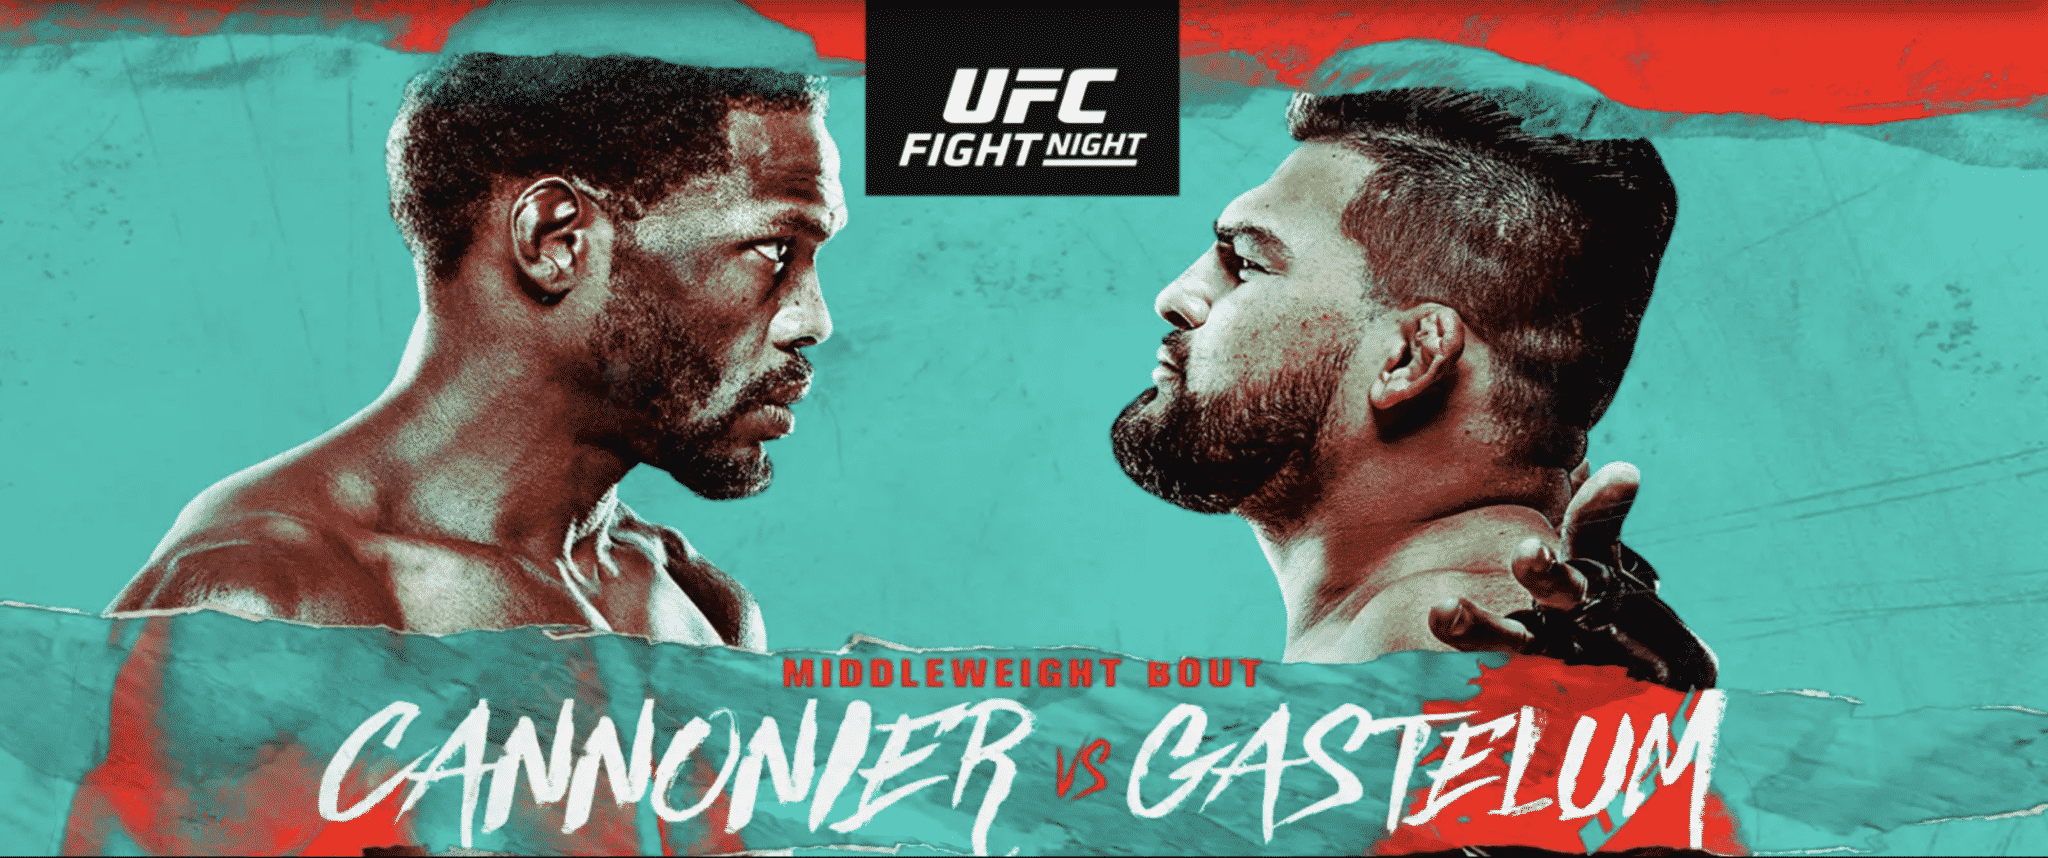 UFC Vegas 34 Betting Guide (Riding Breakfast & Dinner)  MMA Gambling Podcast (Ep.65)